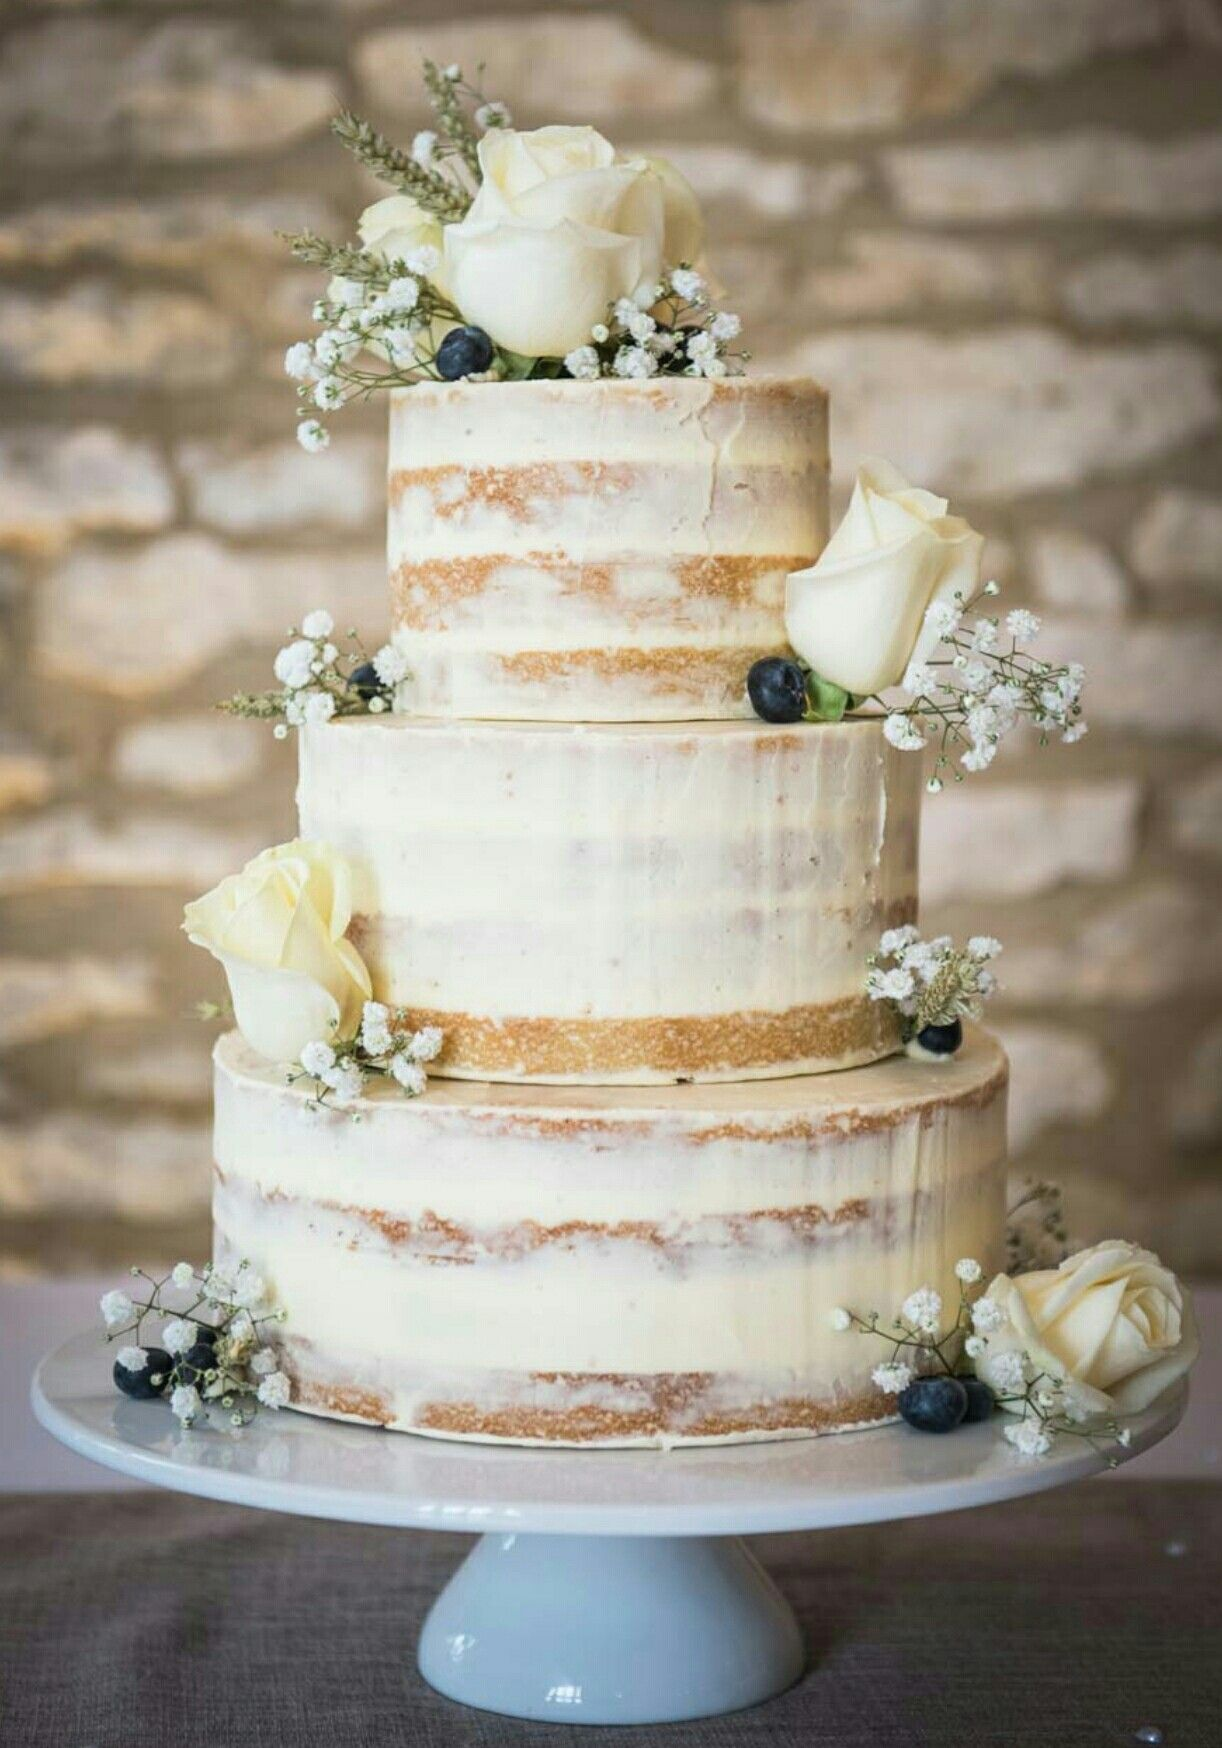 Pin by Kirsten Murphy on Communion | Pinterest | Wedding cake ...